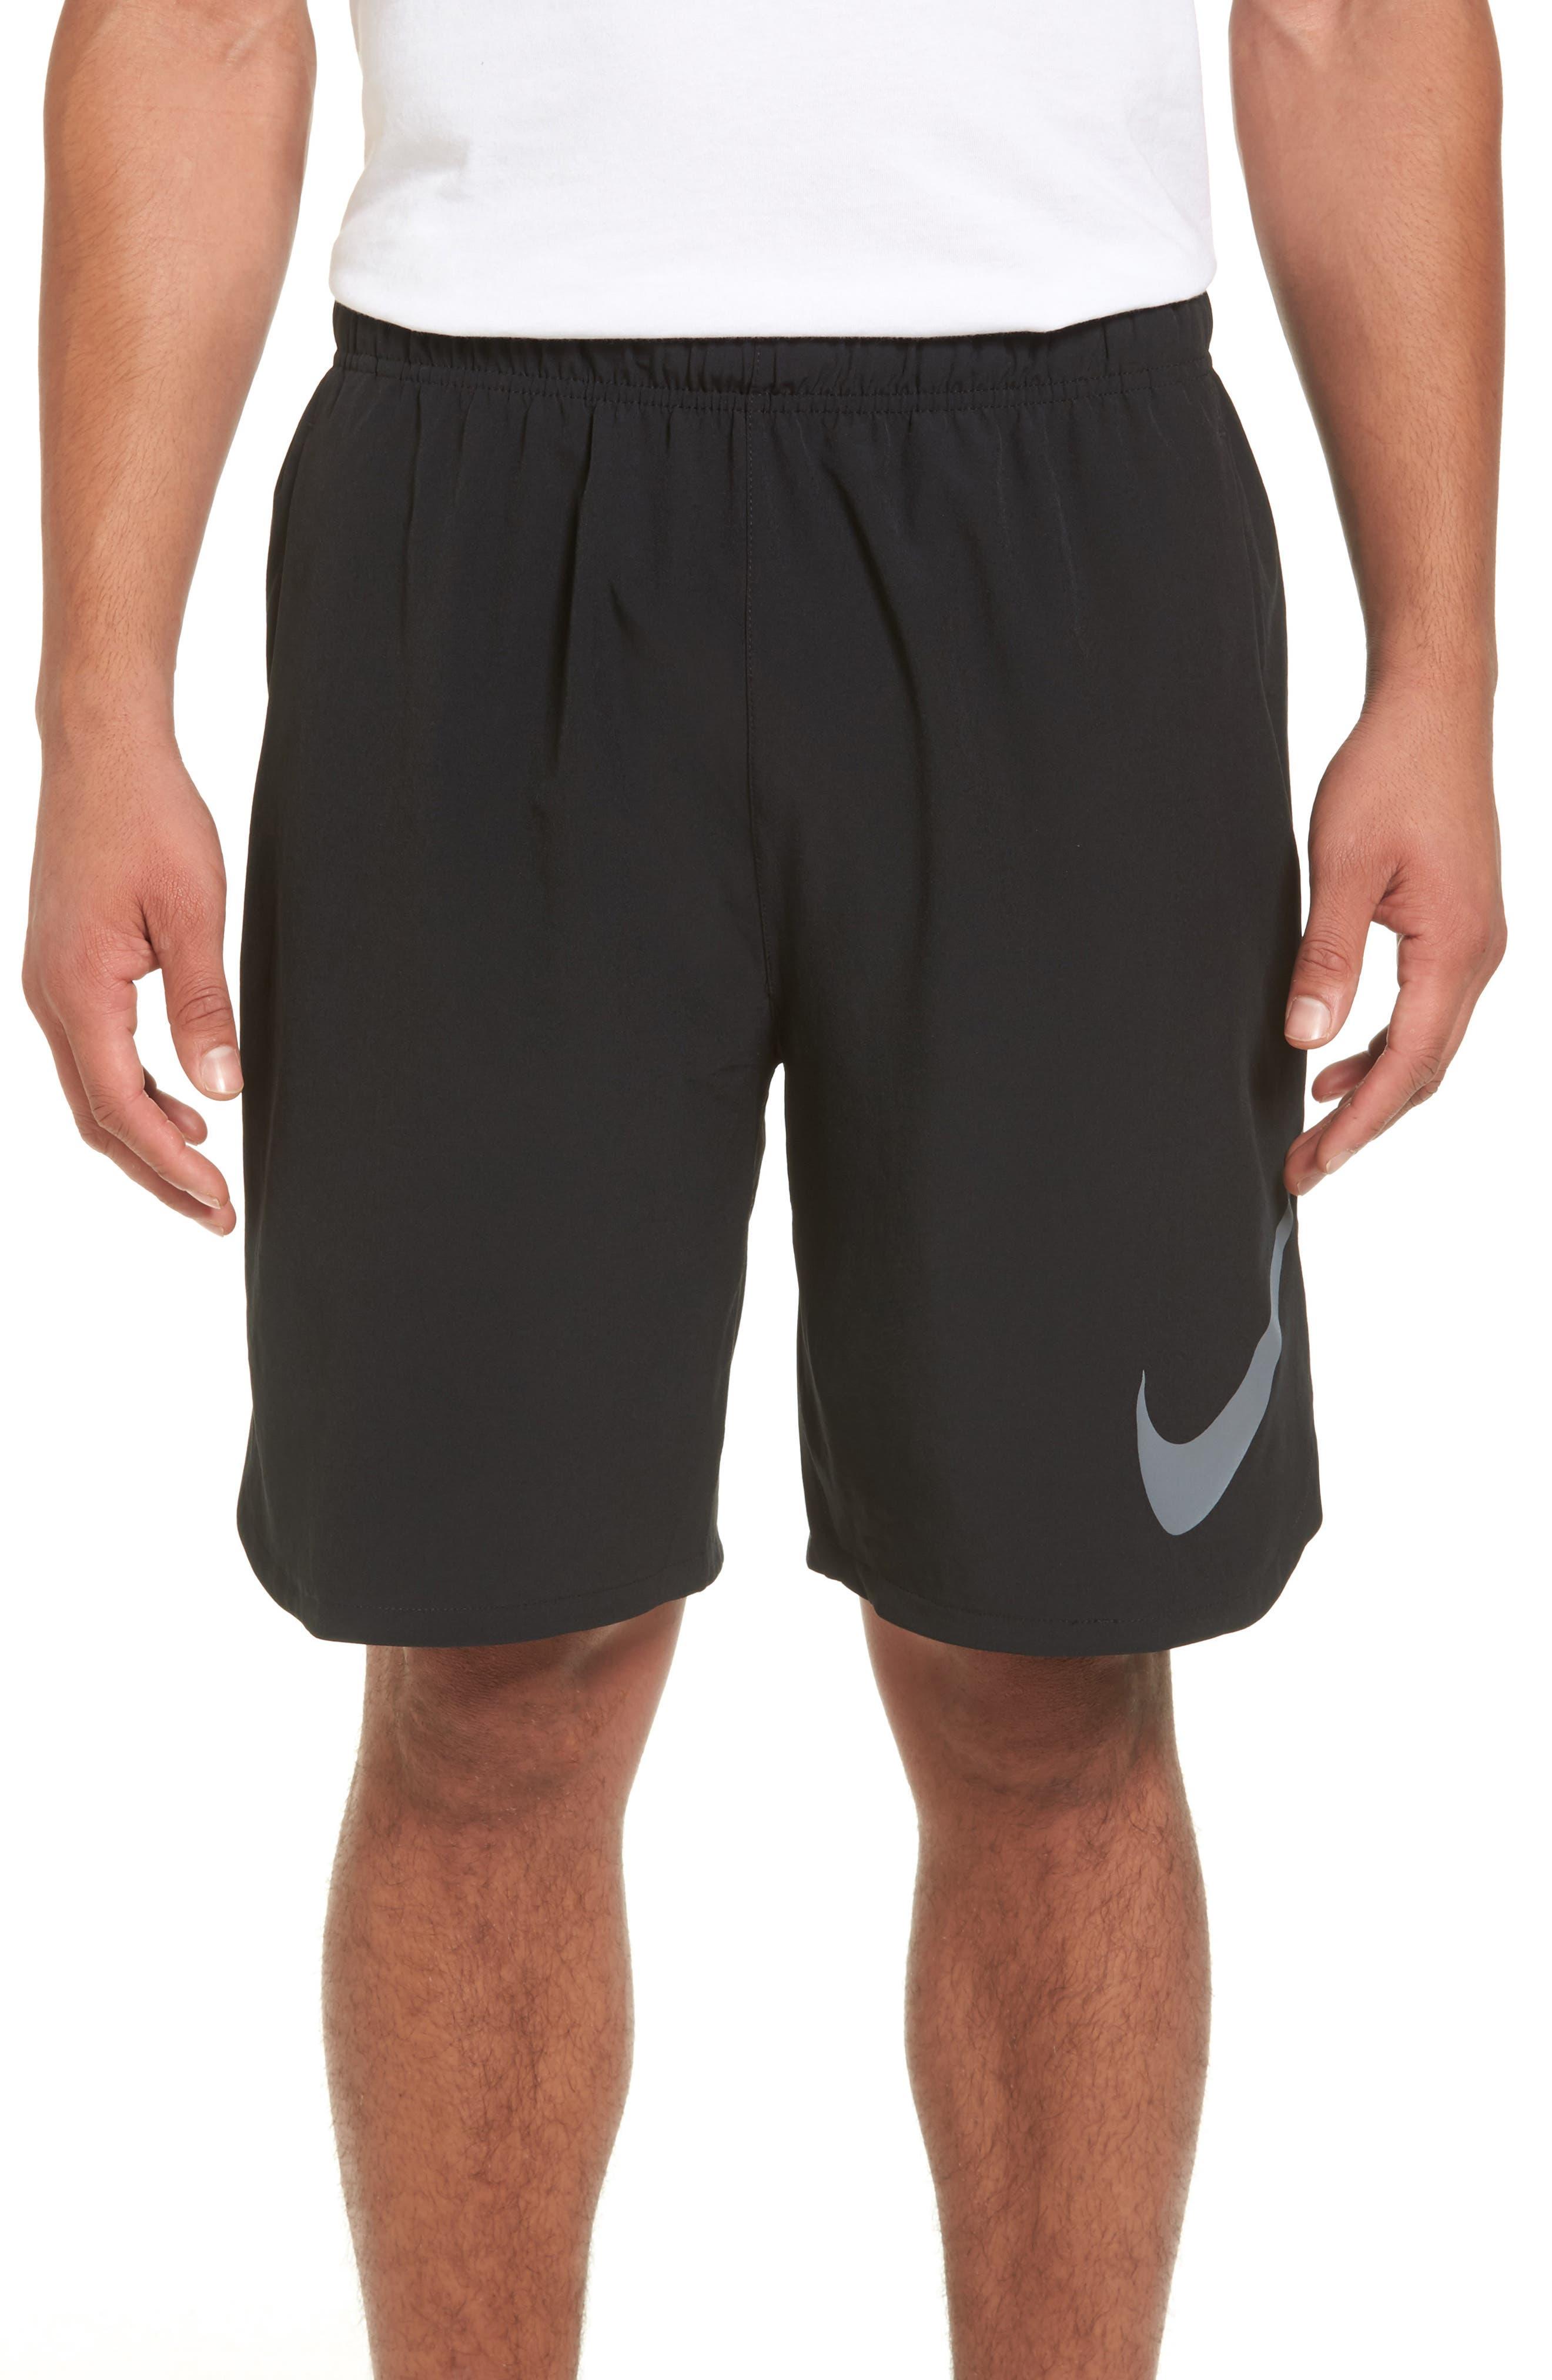 Flex Training Shorts,                         Main,                         color, 010